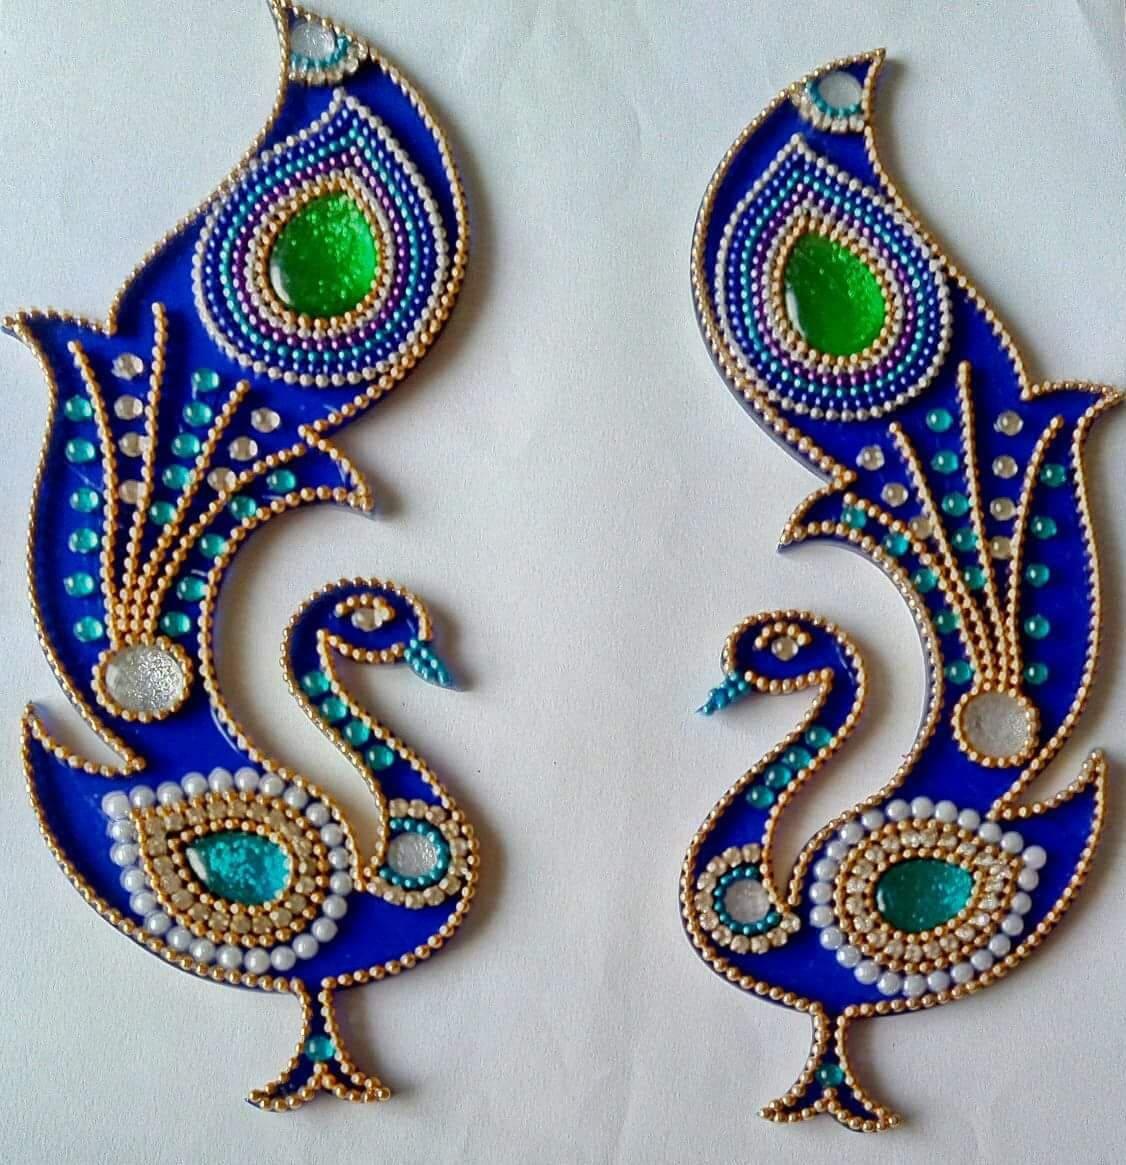 Wedding Kolam Images: Beautiful Kundan Rangoli Floor Art Peacock Design Wedding